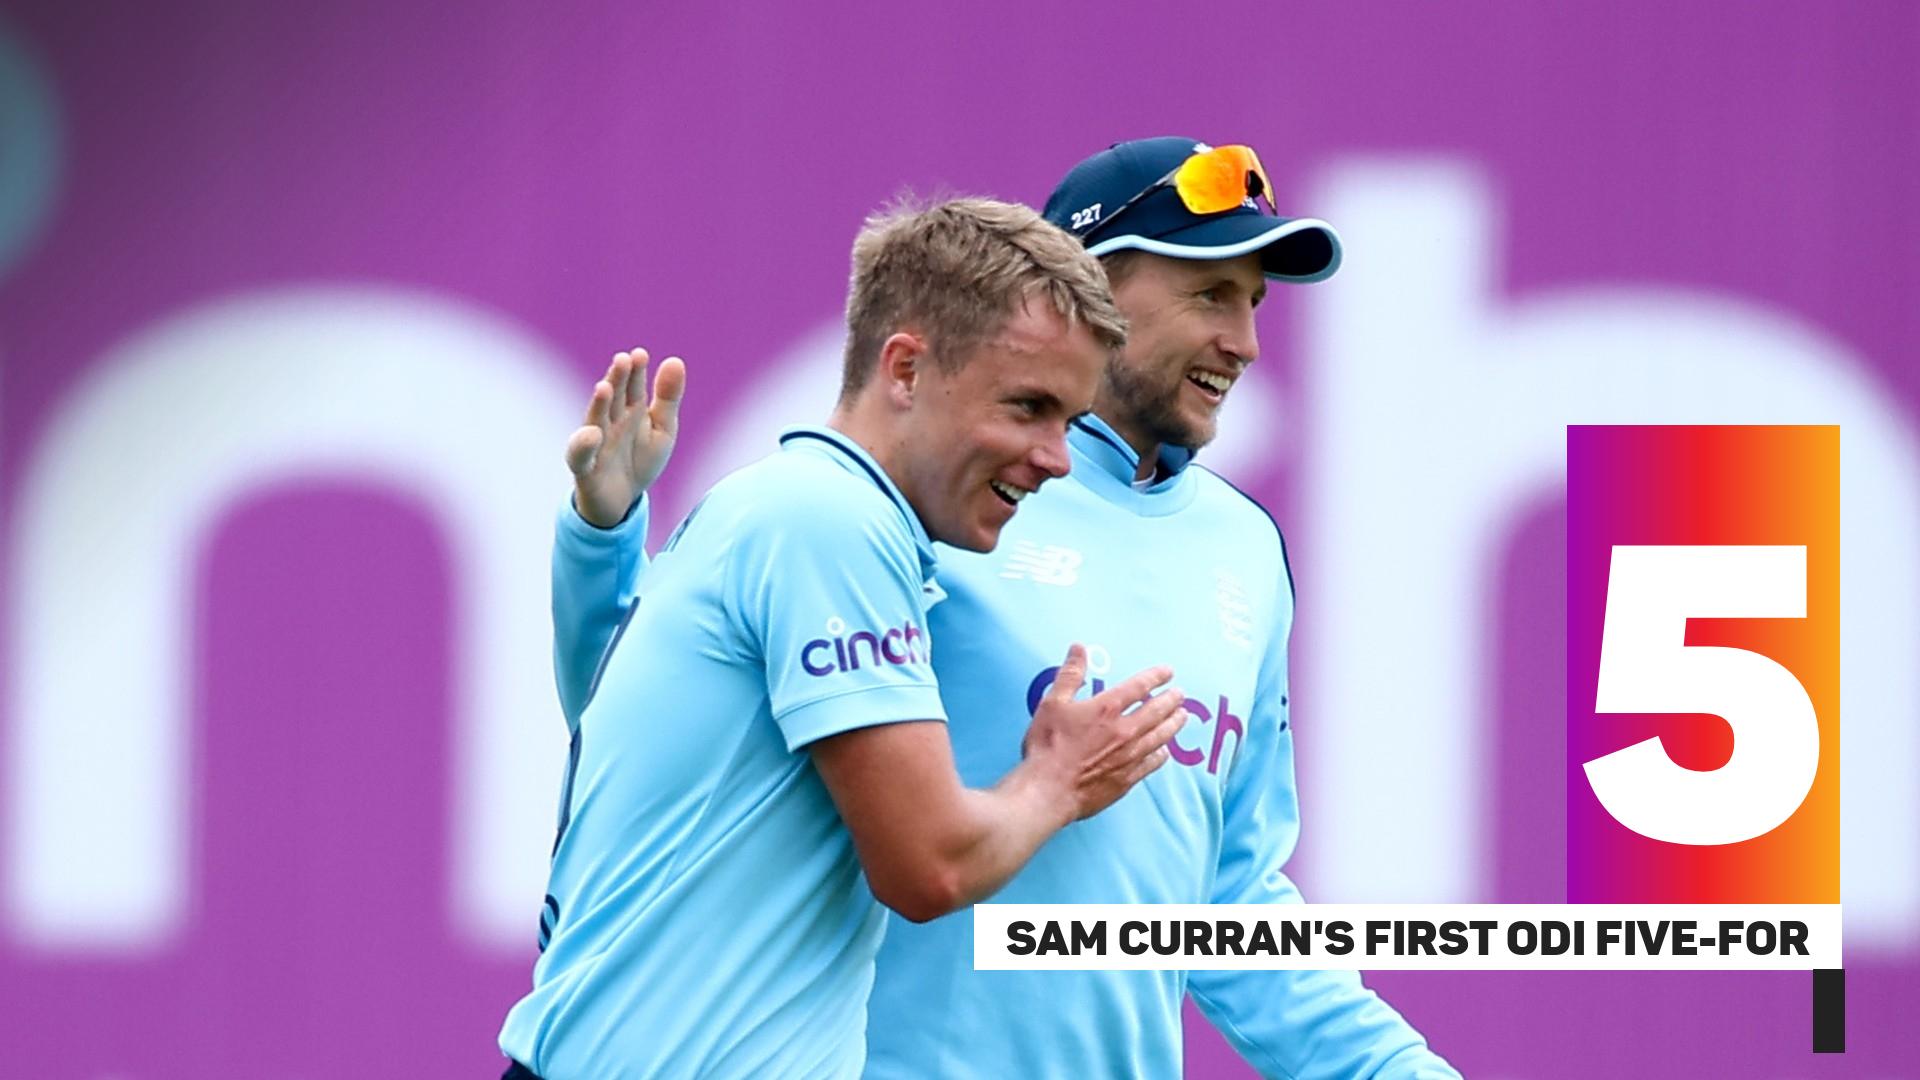 Sam Curran took his first ODI five-for